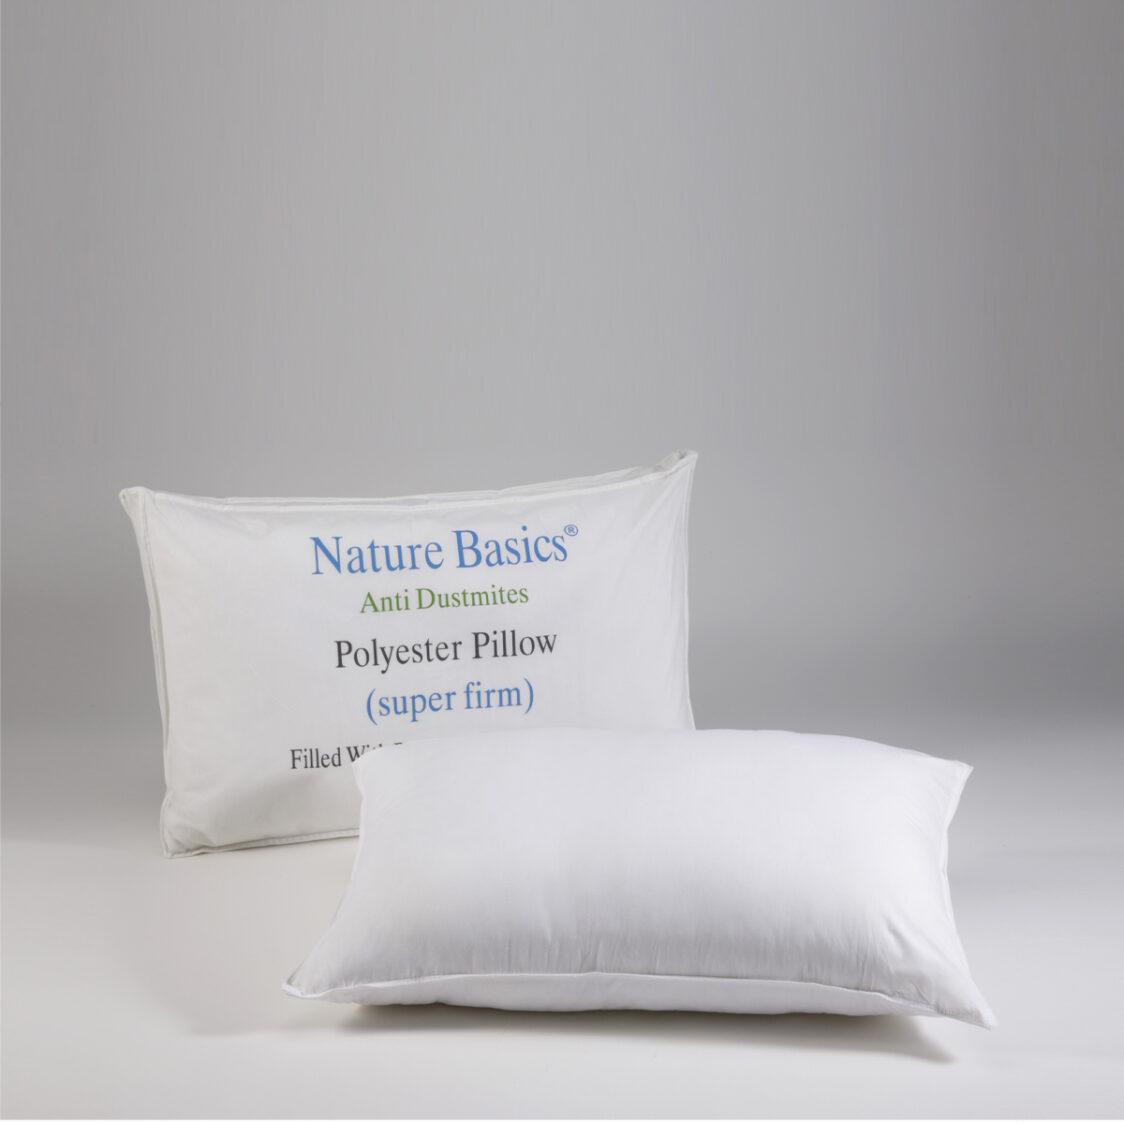 Polyester Pillow Super Firm